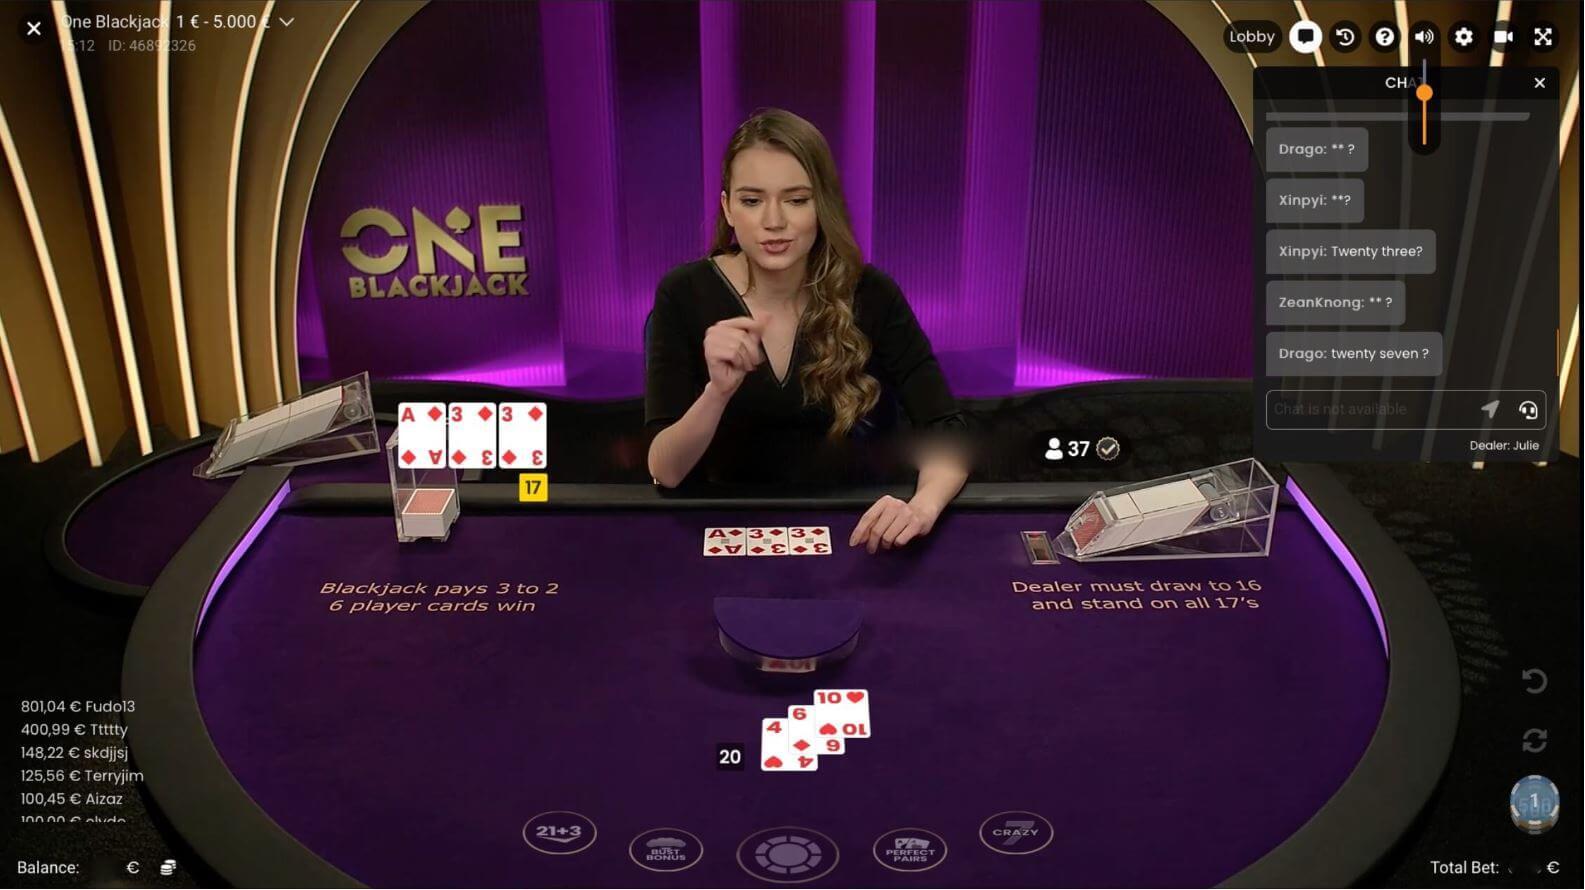 Live blackjack online - ONE Blackjack by Pragmatic Play 1585x890